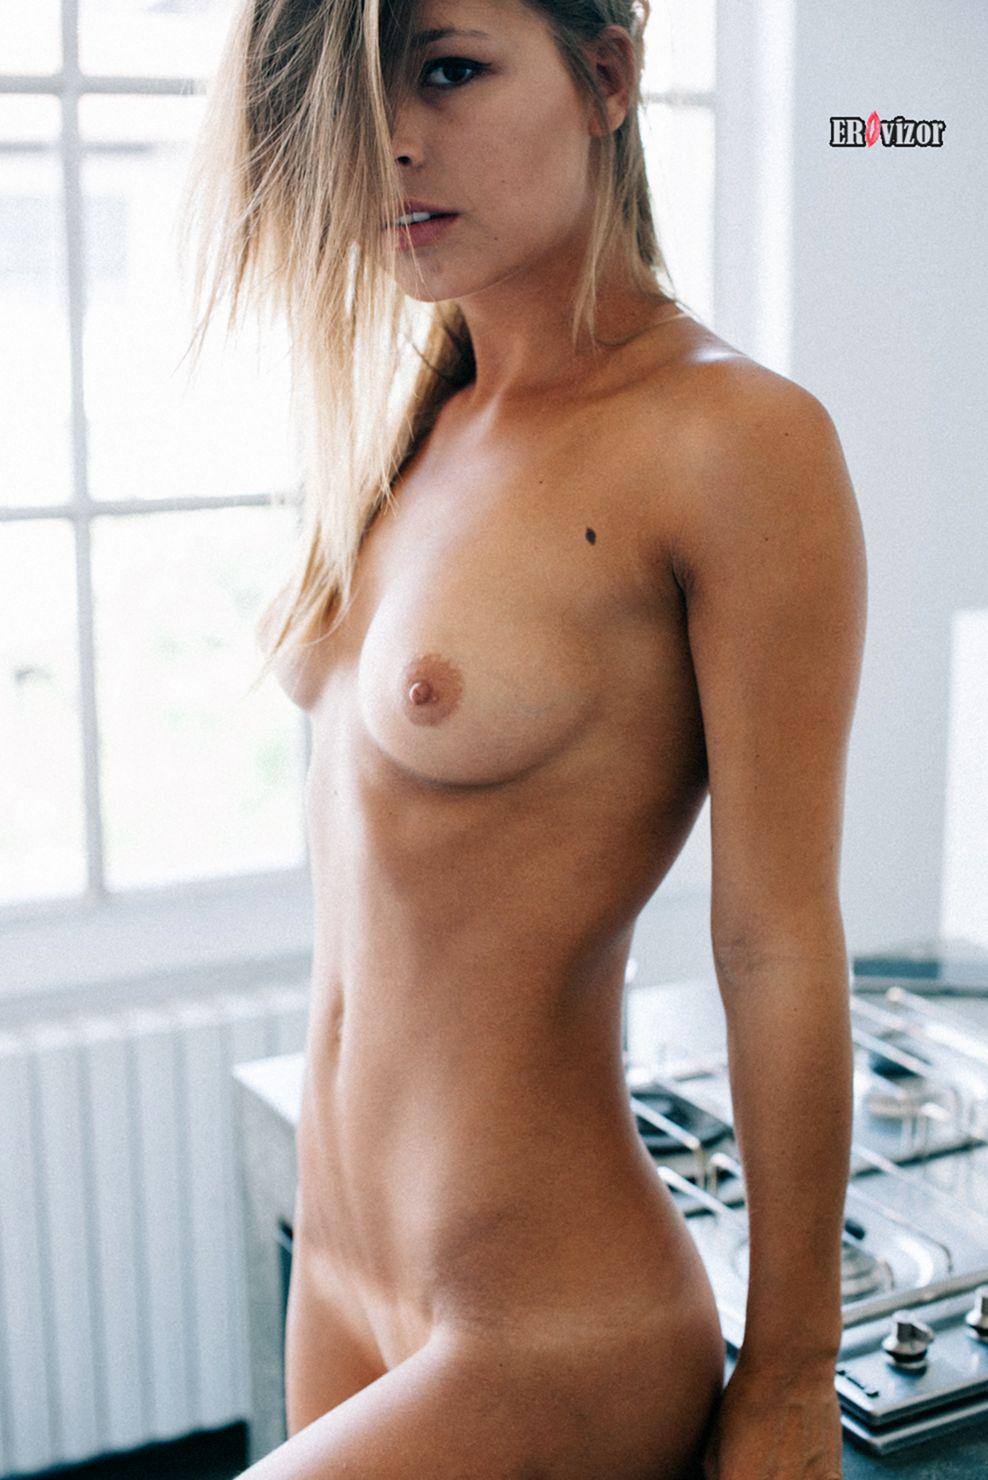 legkaya_erotica-erovizor (79)